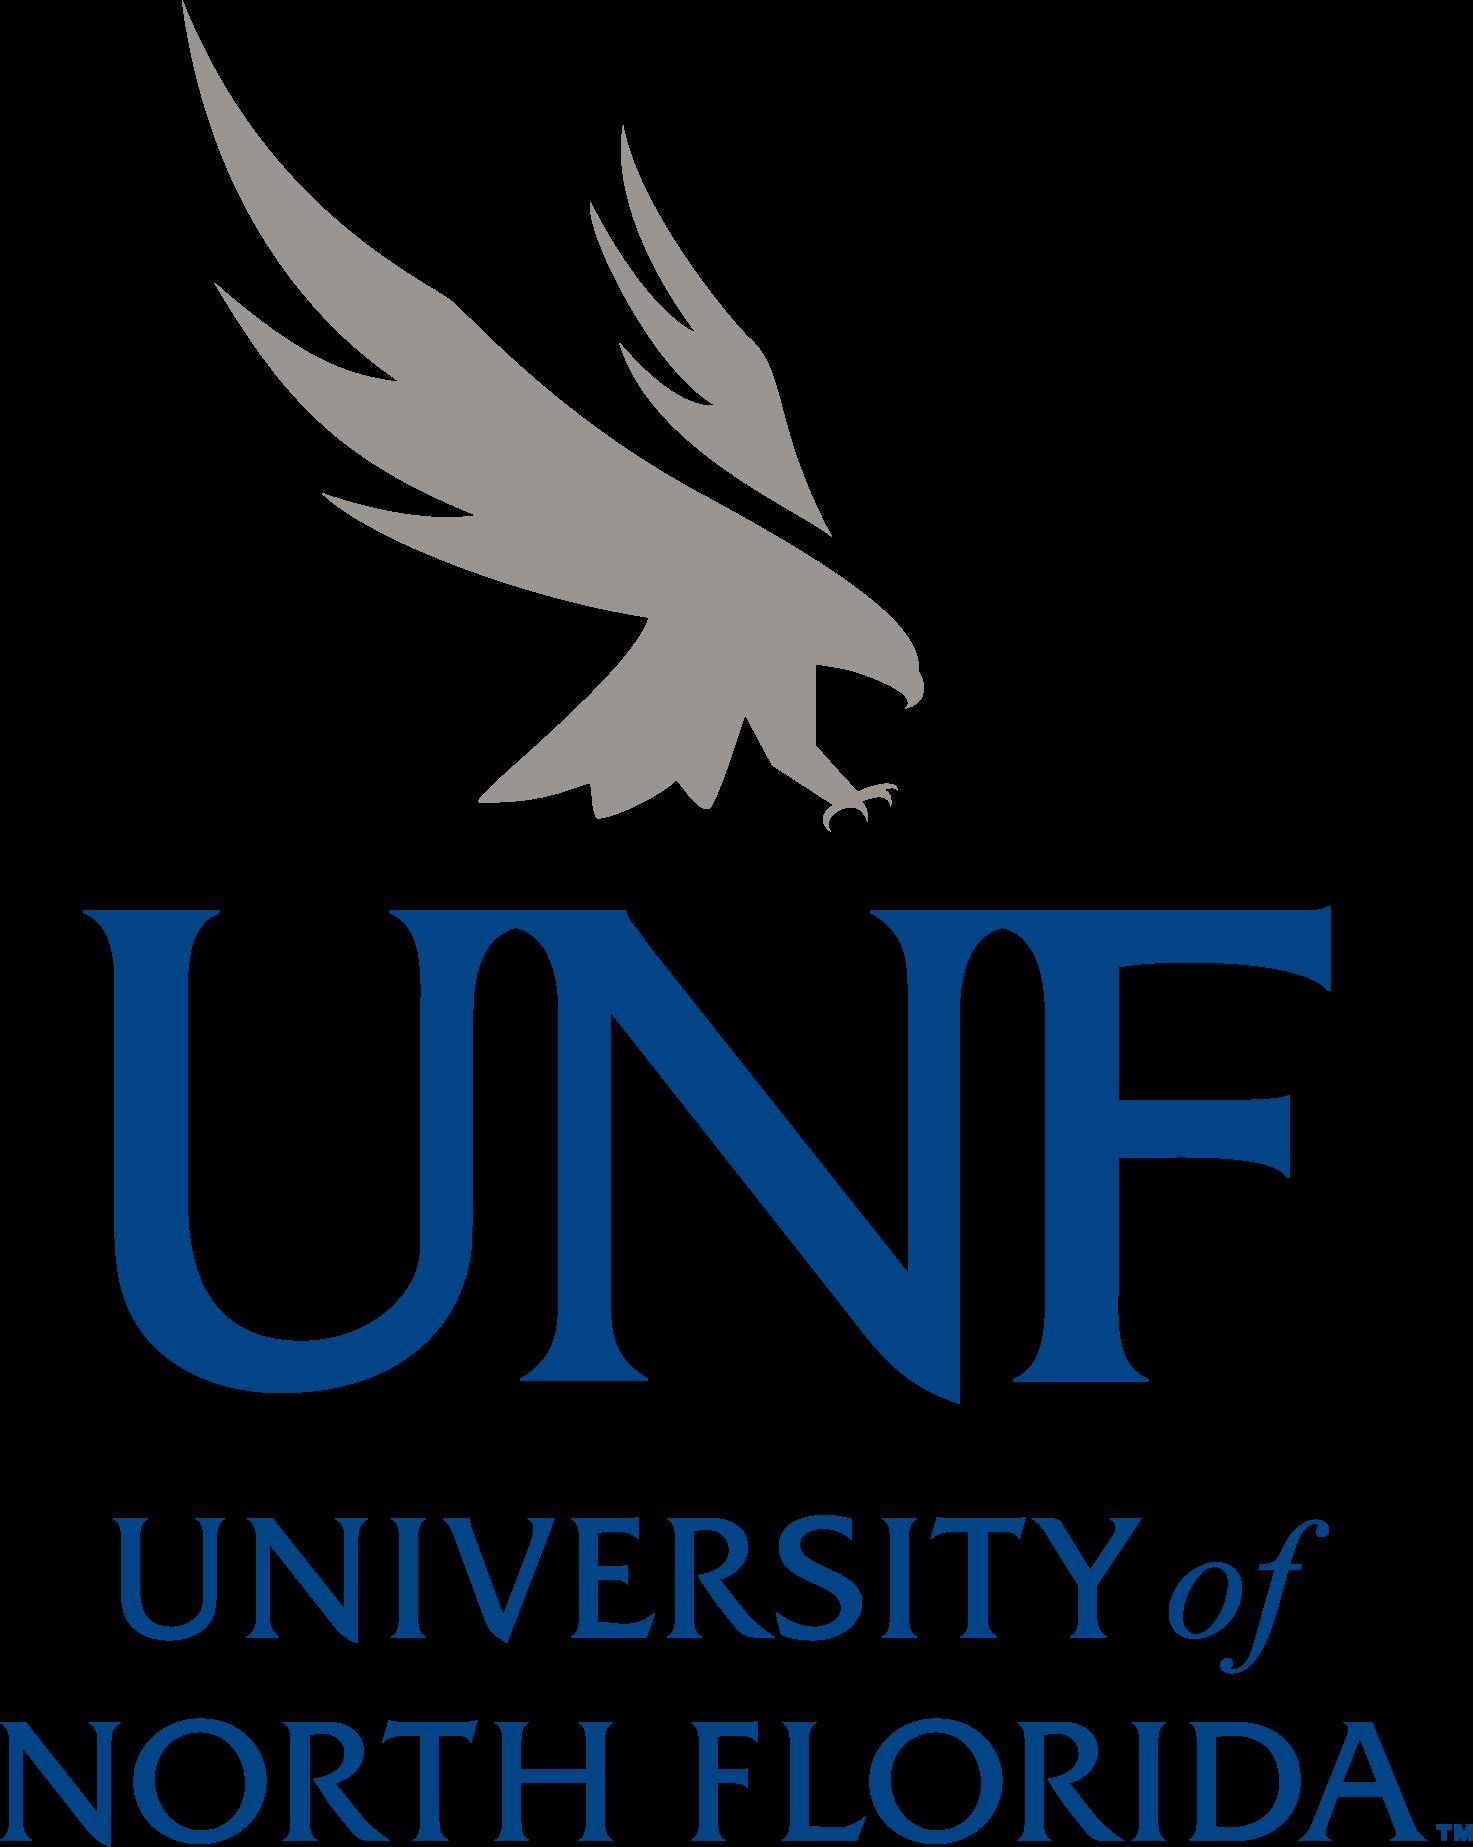 University Of North Florida University Education Jobs Public University